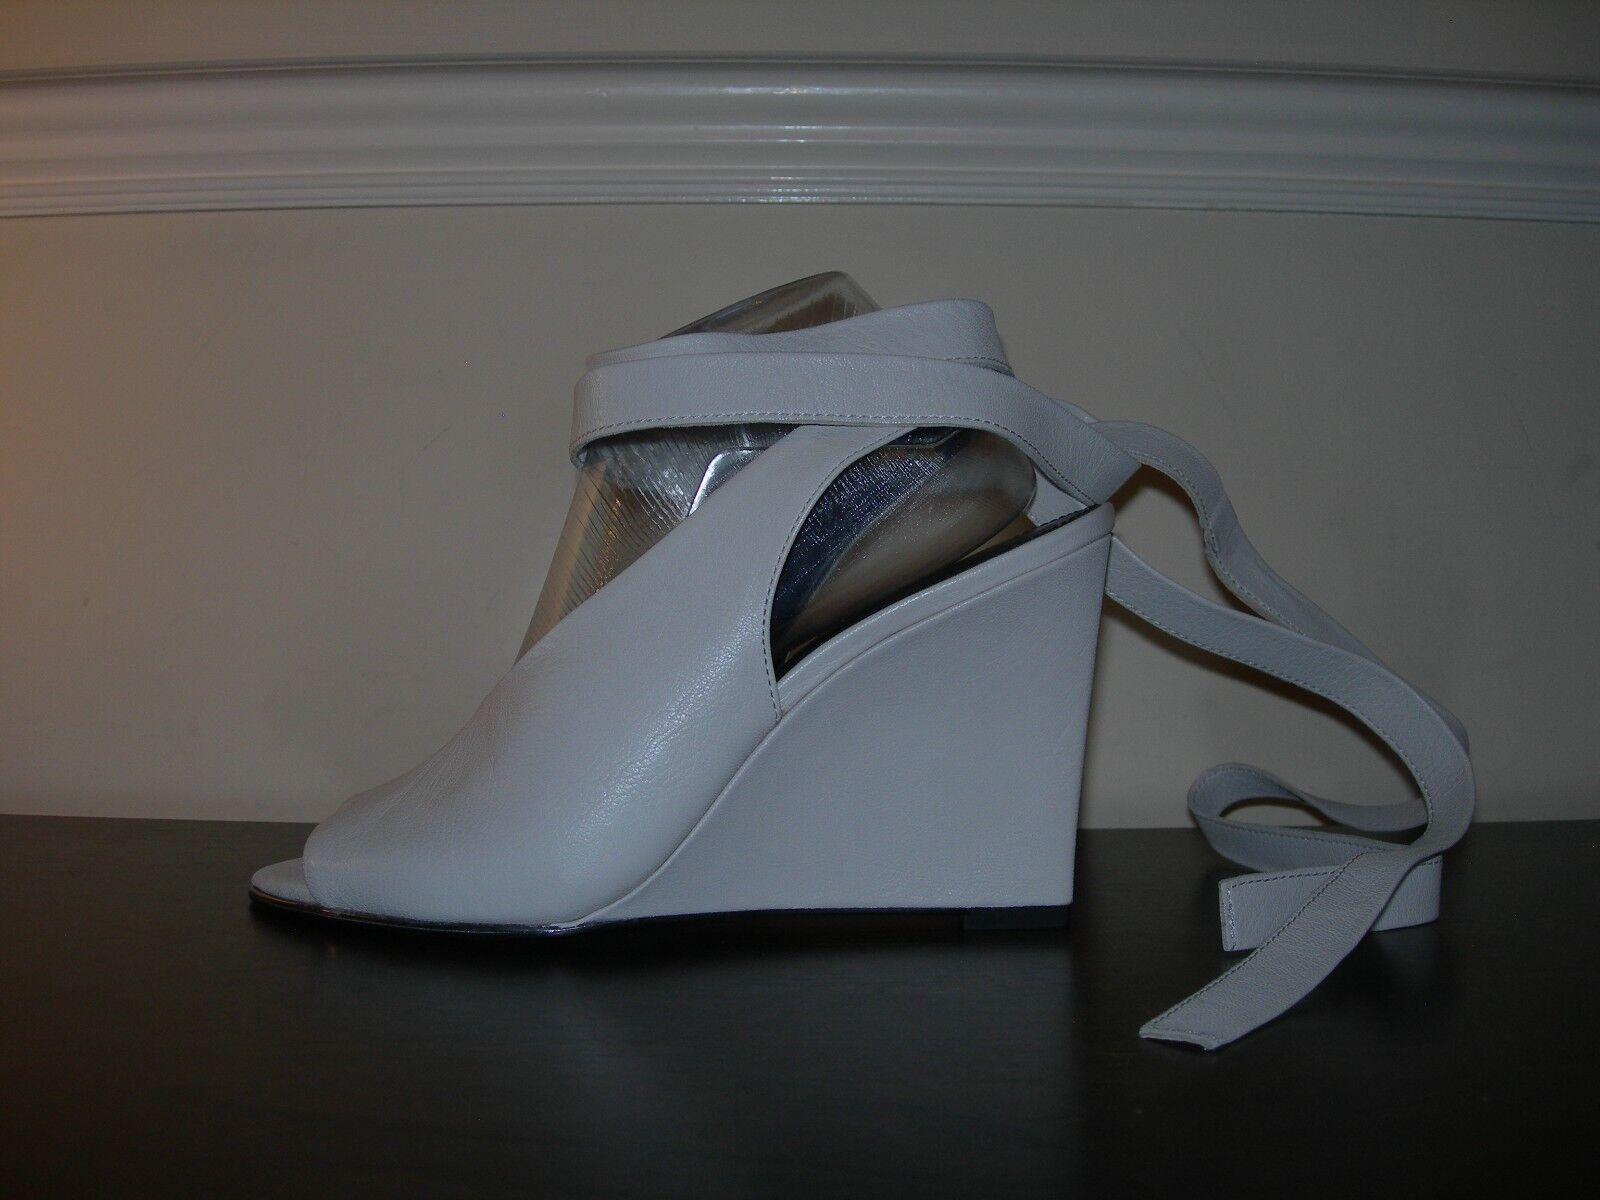 NEXT Scarpe Donna Sandali Zeppe crema Open Toes Gamba CRAVATTE crema Zeppe in pelle 41 EU/ 287823